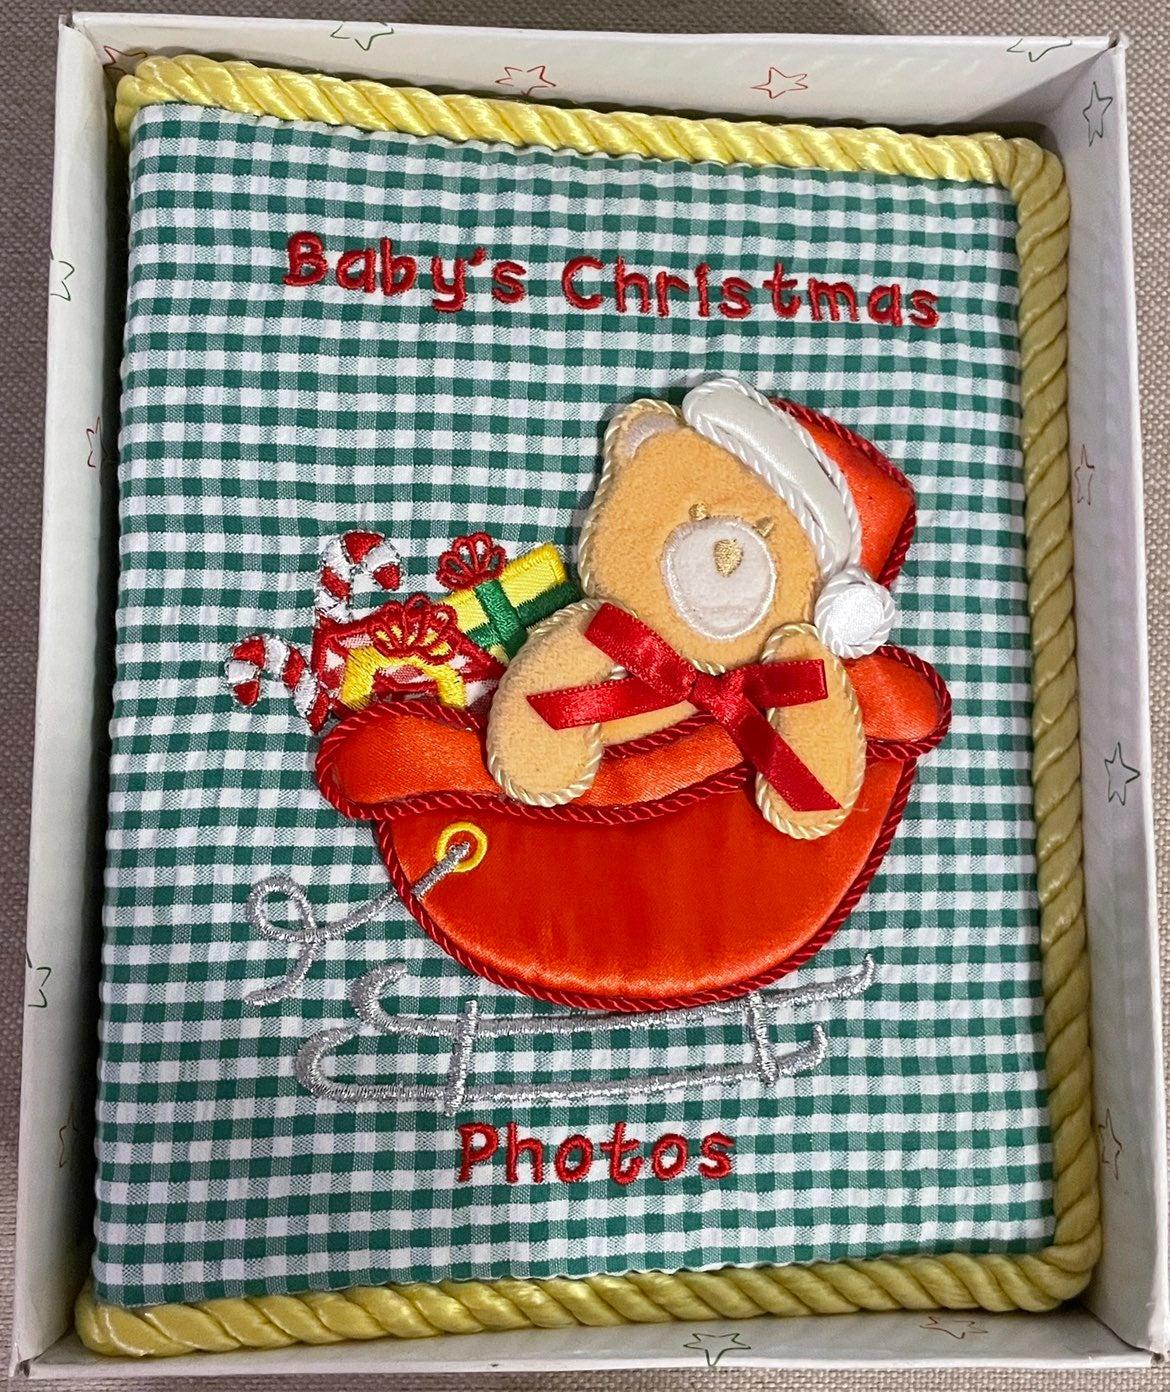 Baby's Christmas Photos photo album